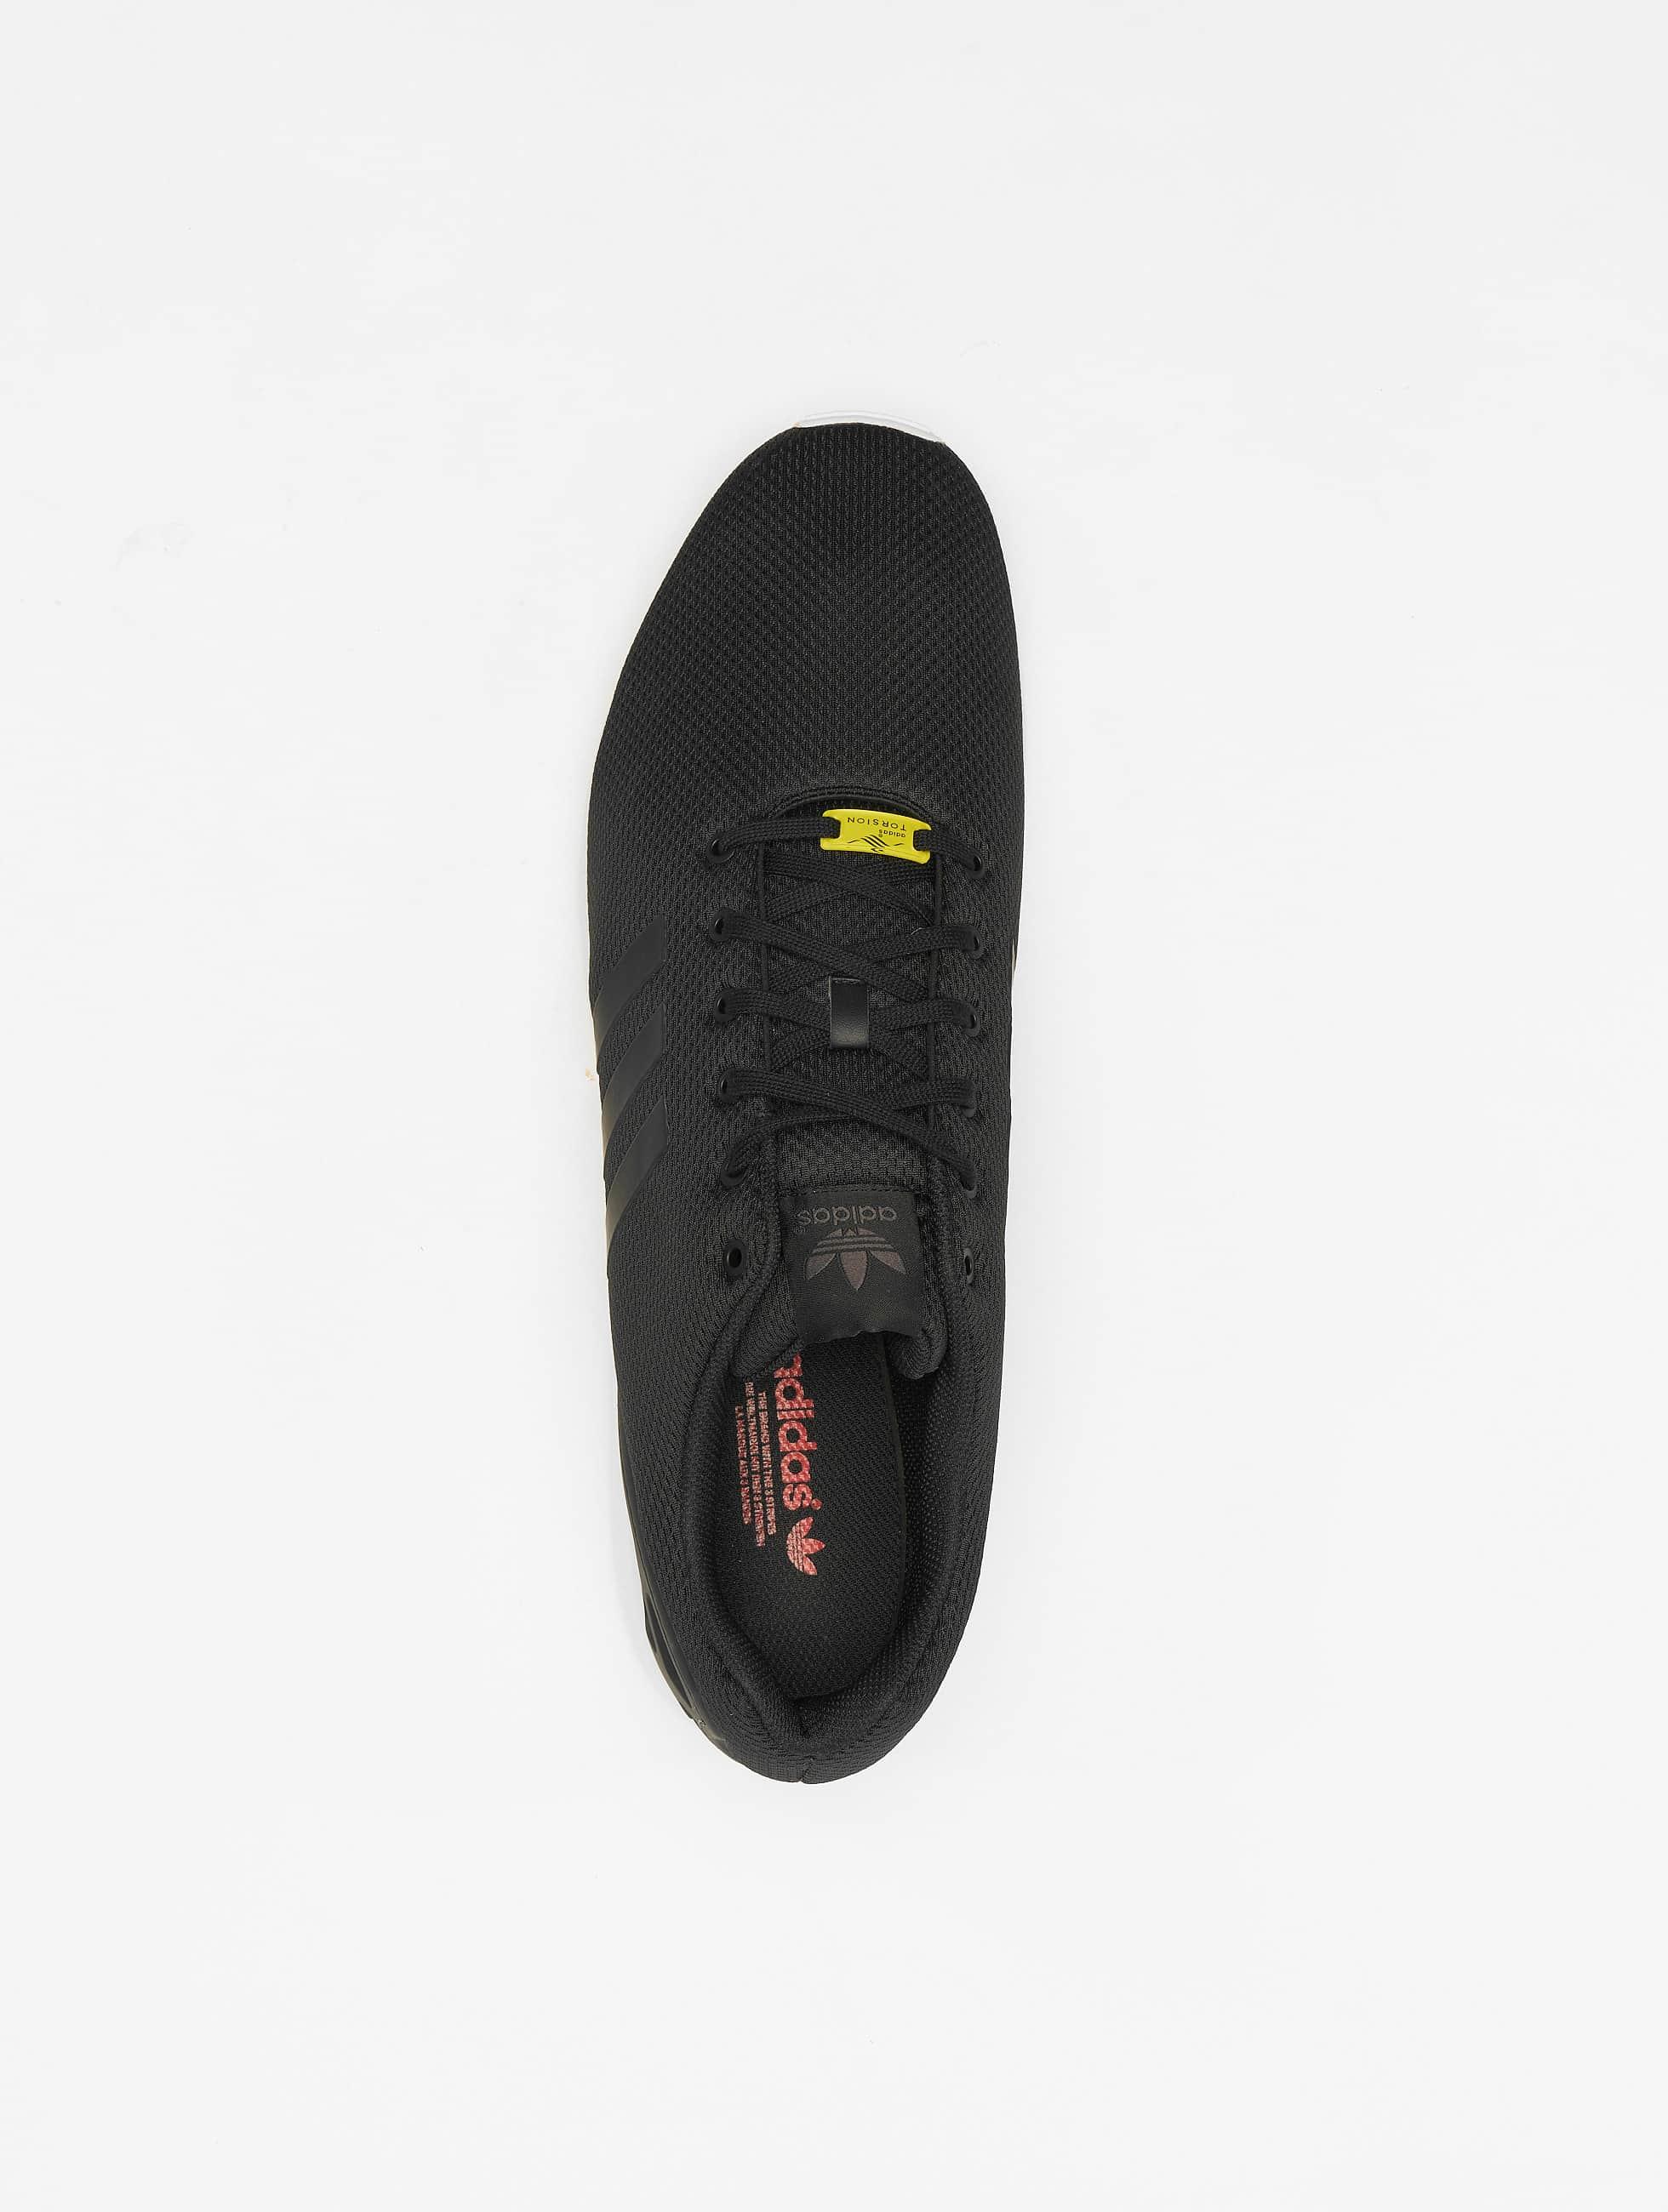 adidas sneaker grau schwarz gress. Black Bedroom Furniture Sets. Home Design Ideas